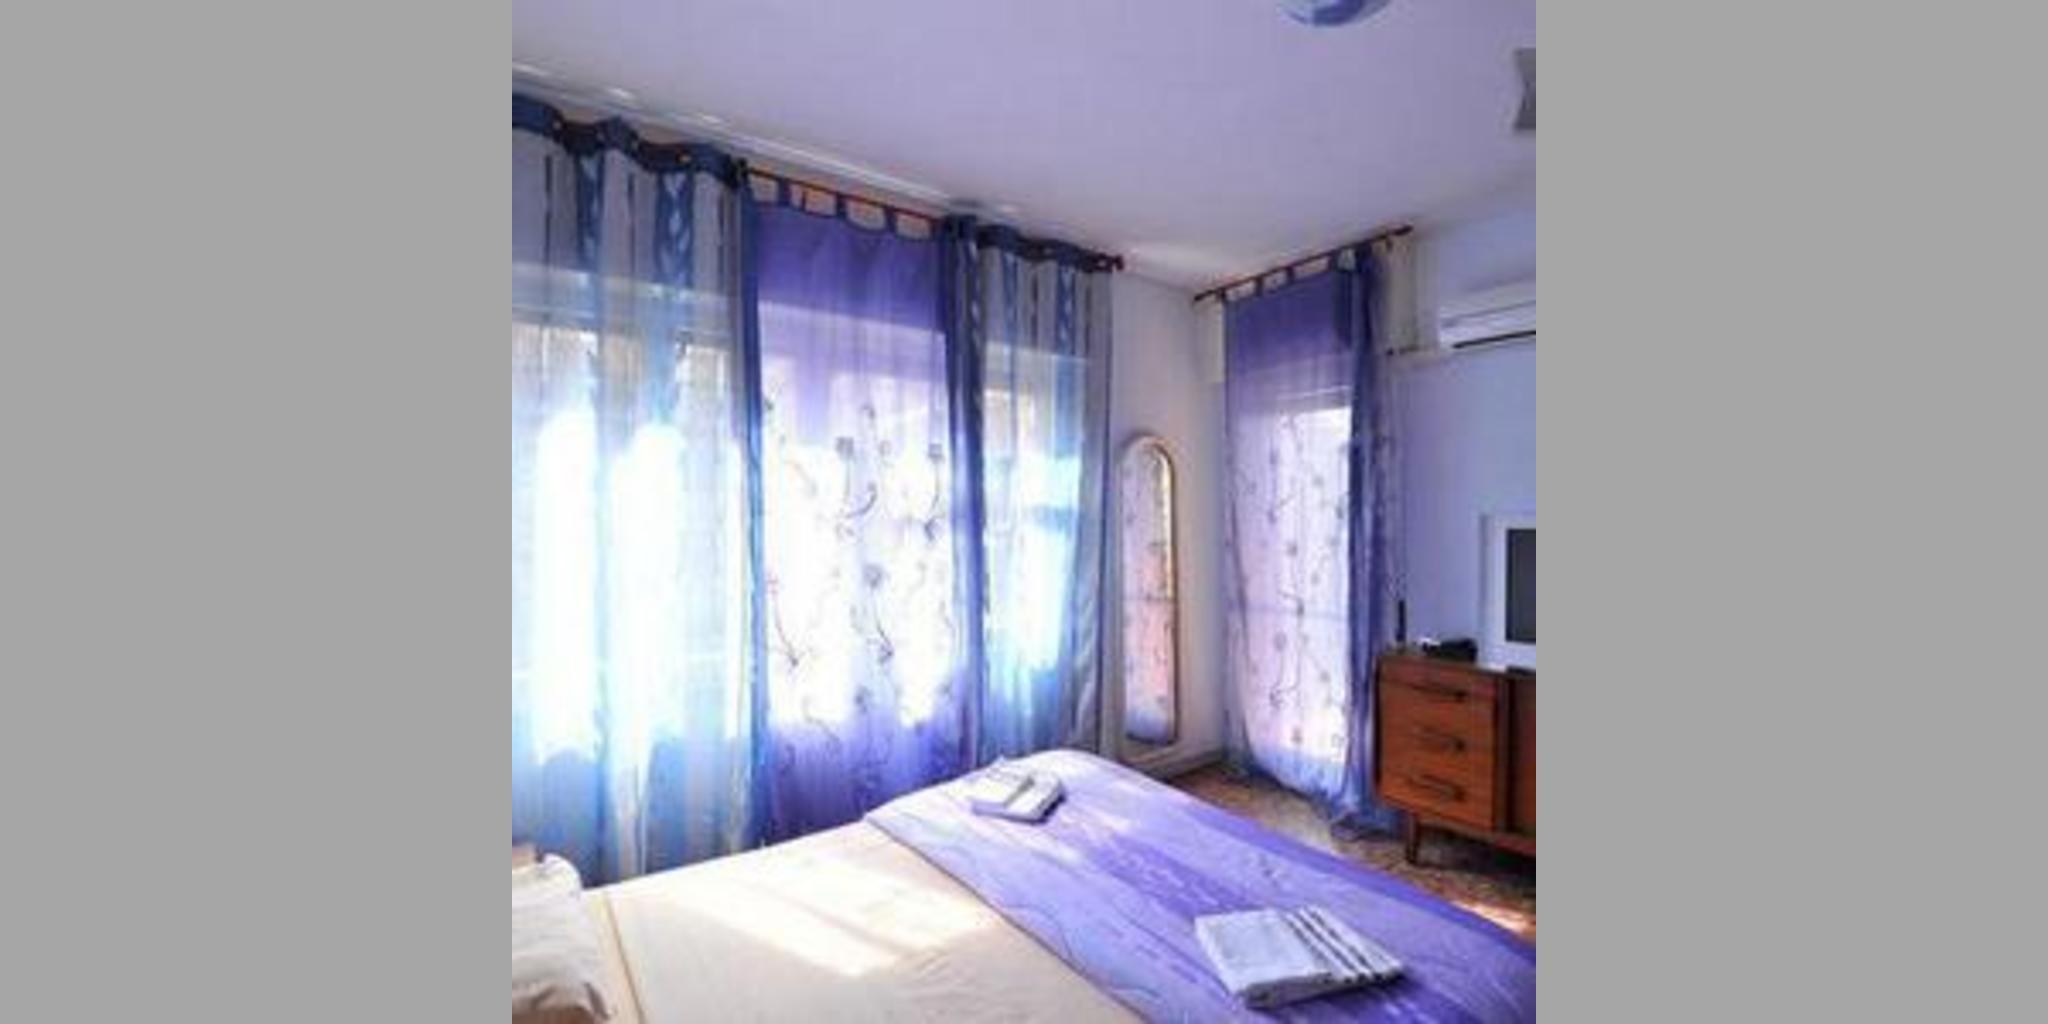 b_RX2053_20120914025910_blu.jpg